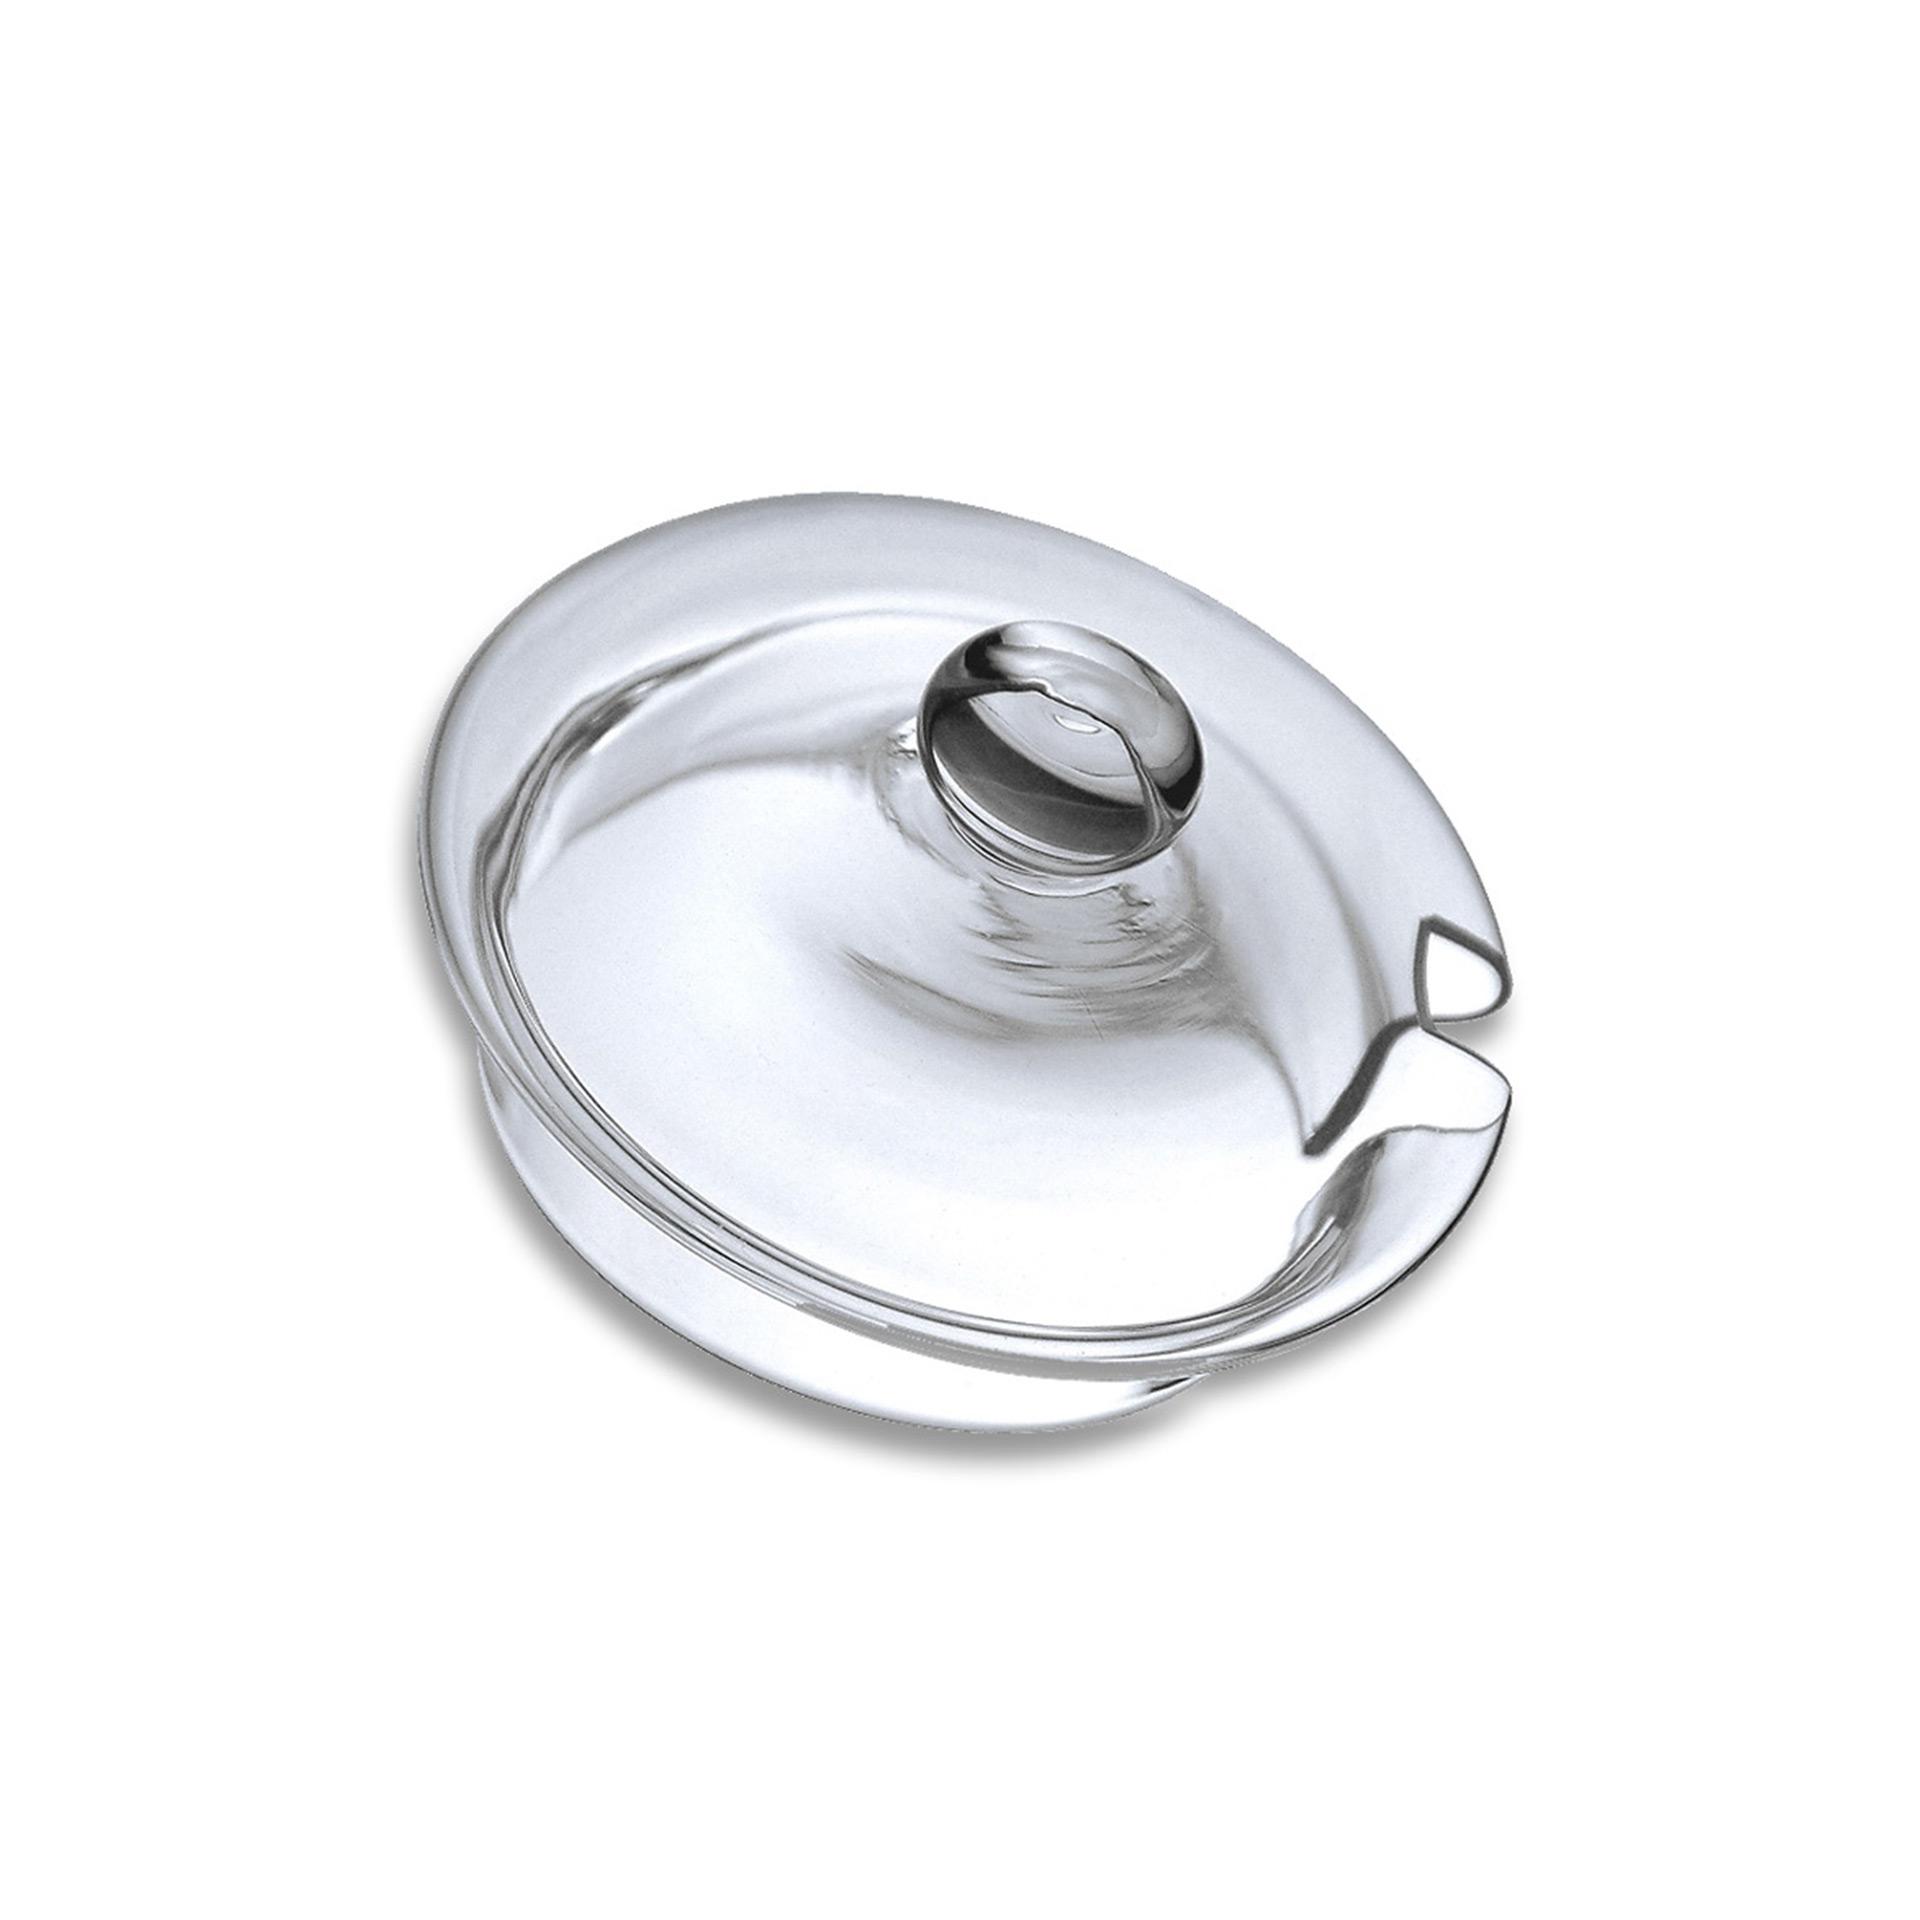 aqua living Deckel für Edelkaraffe aus Glas